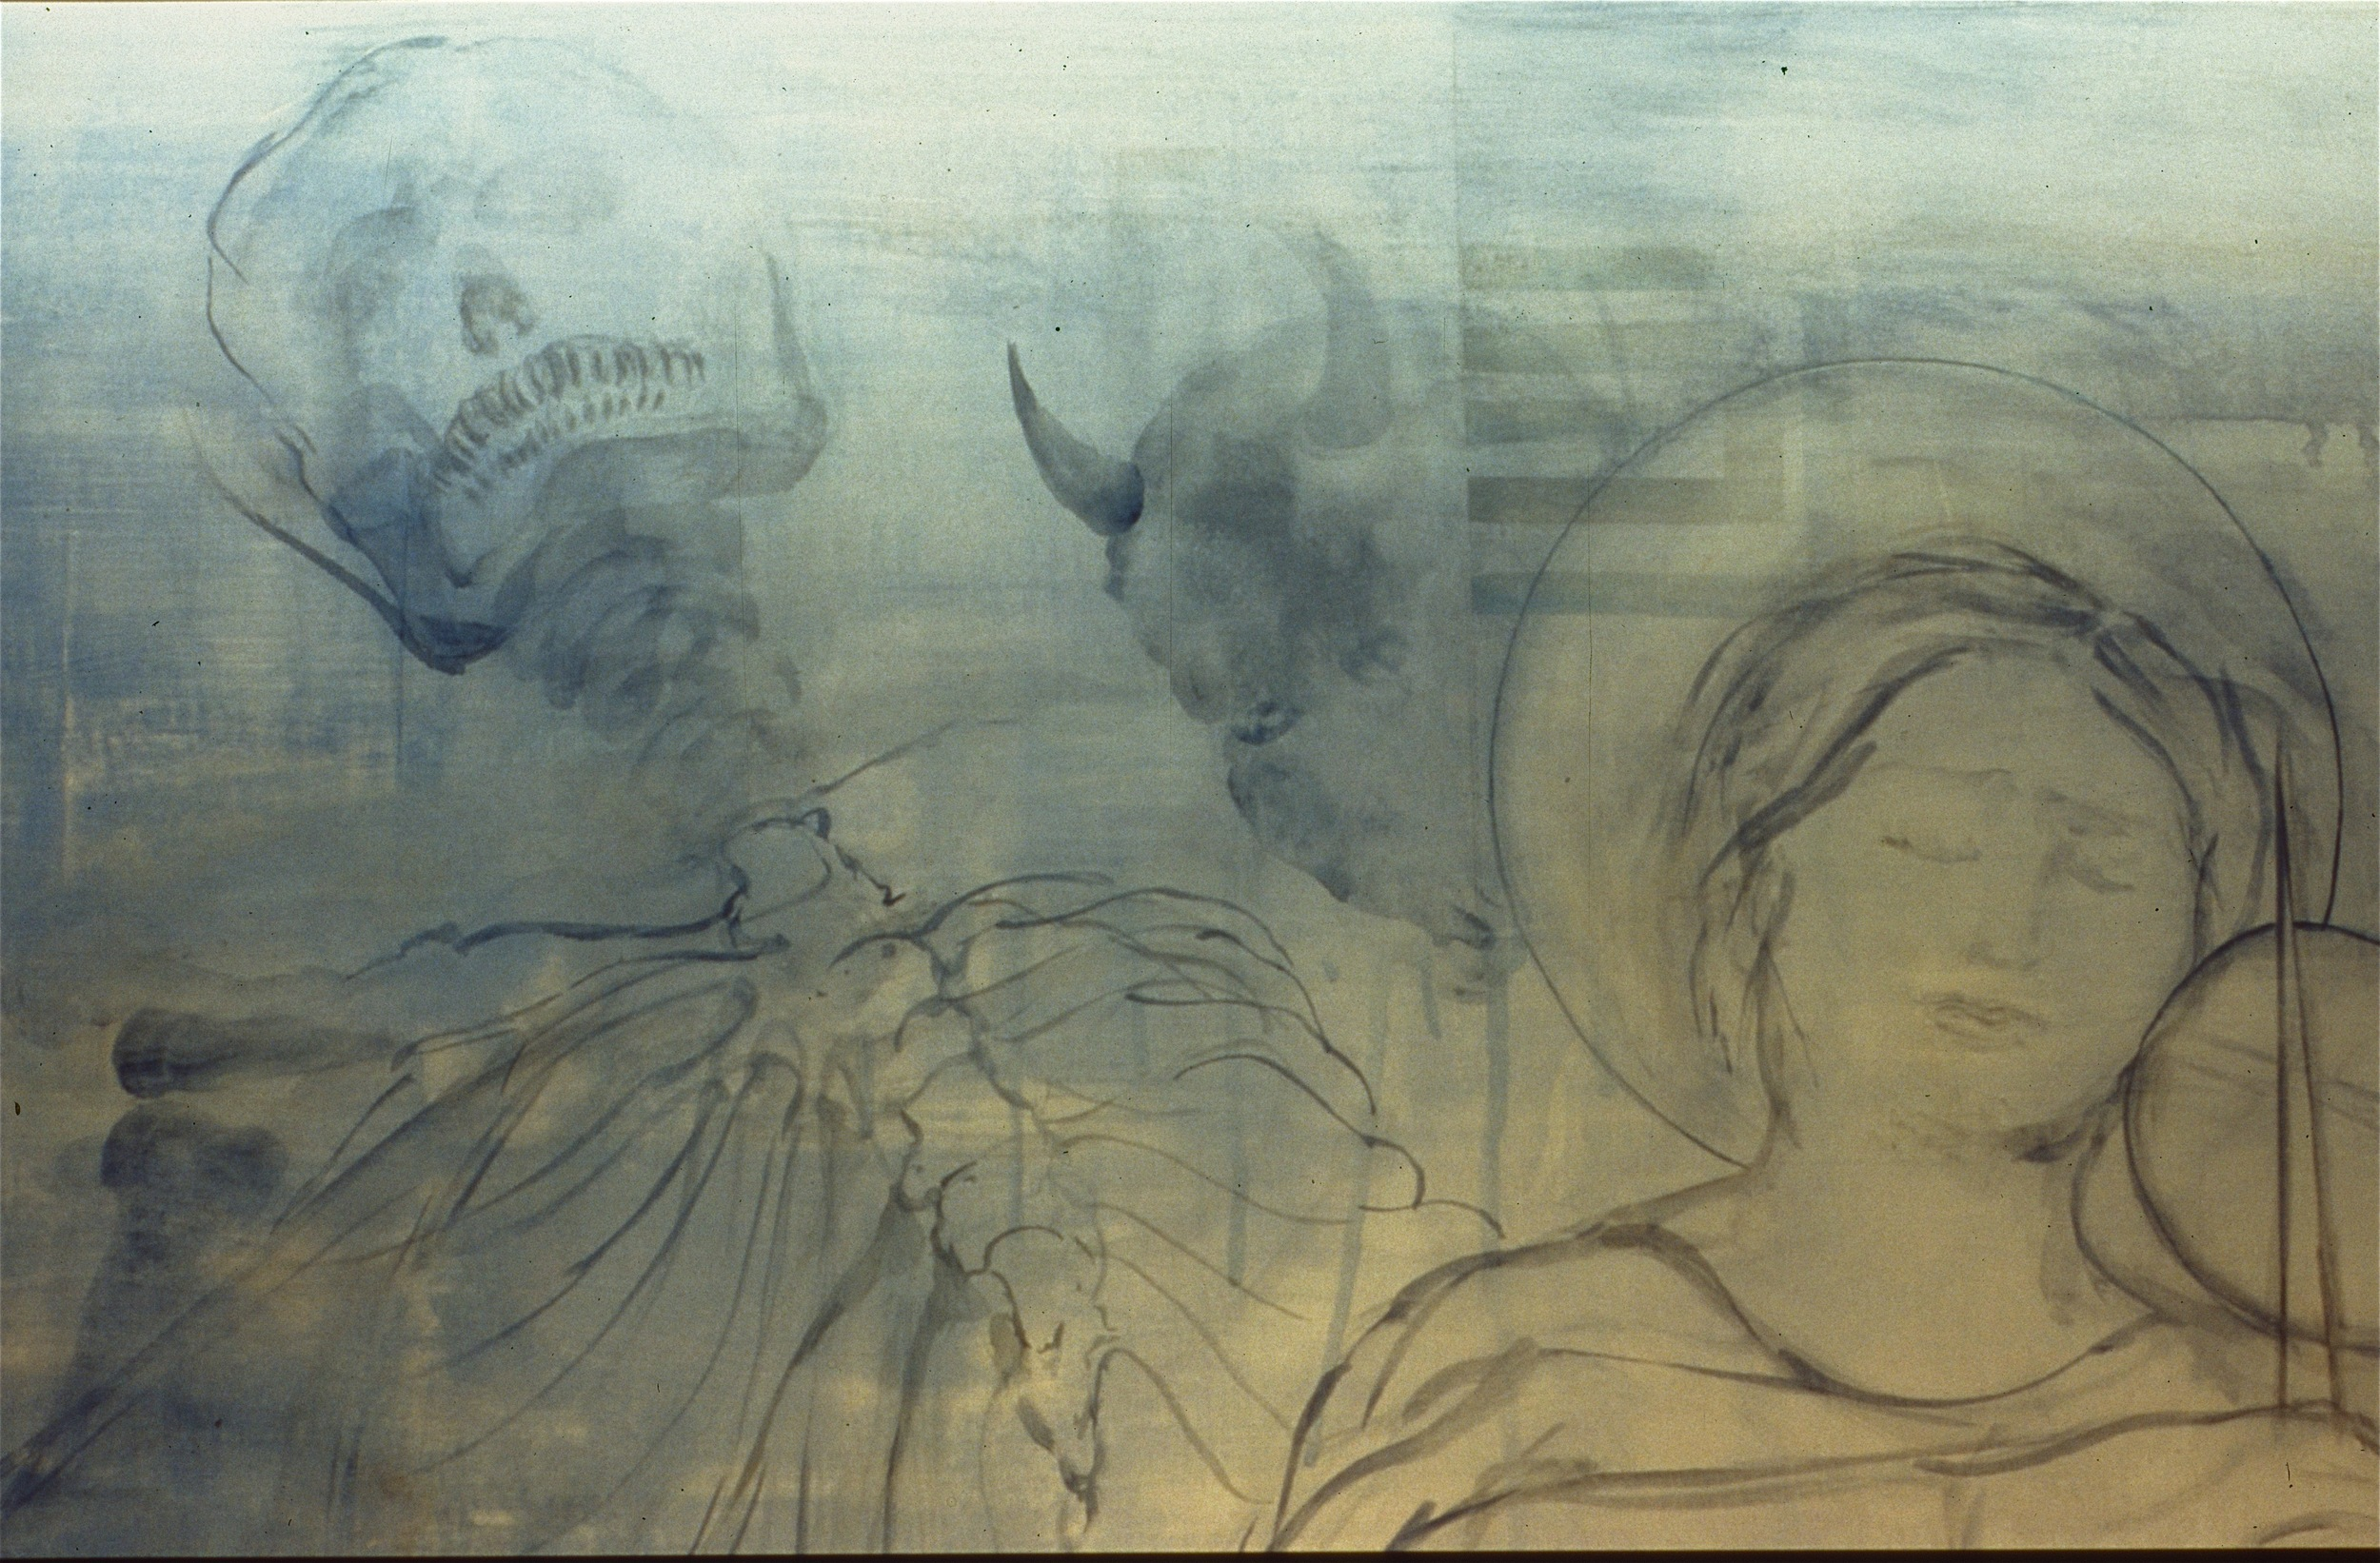 recuerdo (after Tomas Rivera)  (detail)  2002